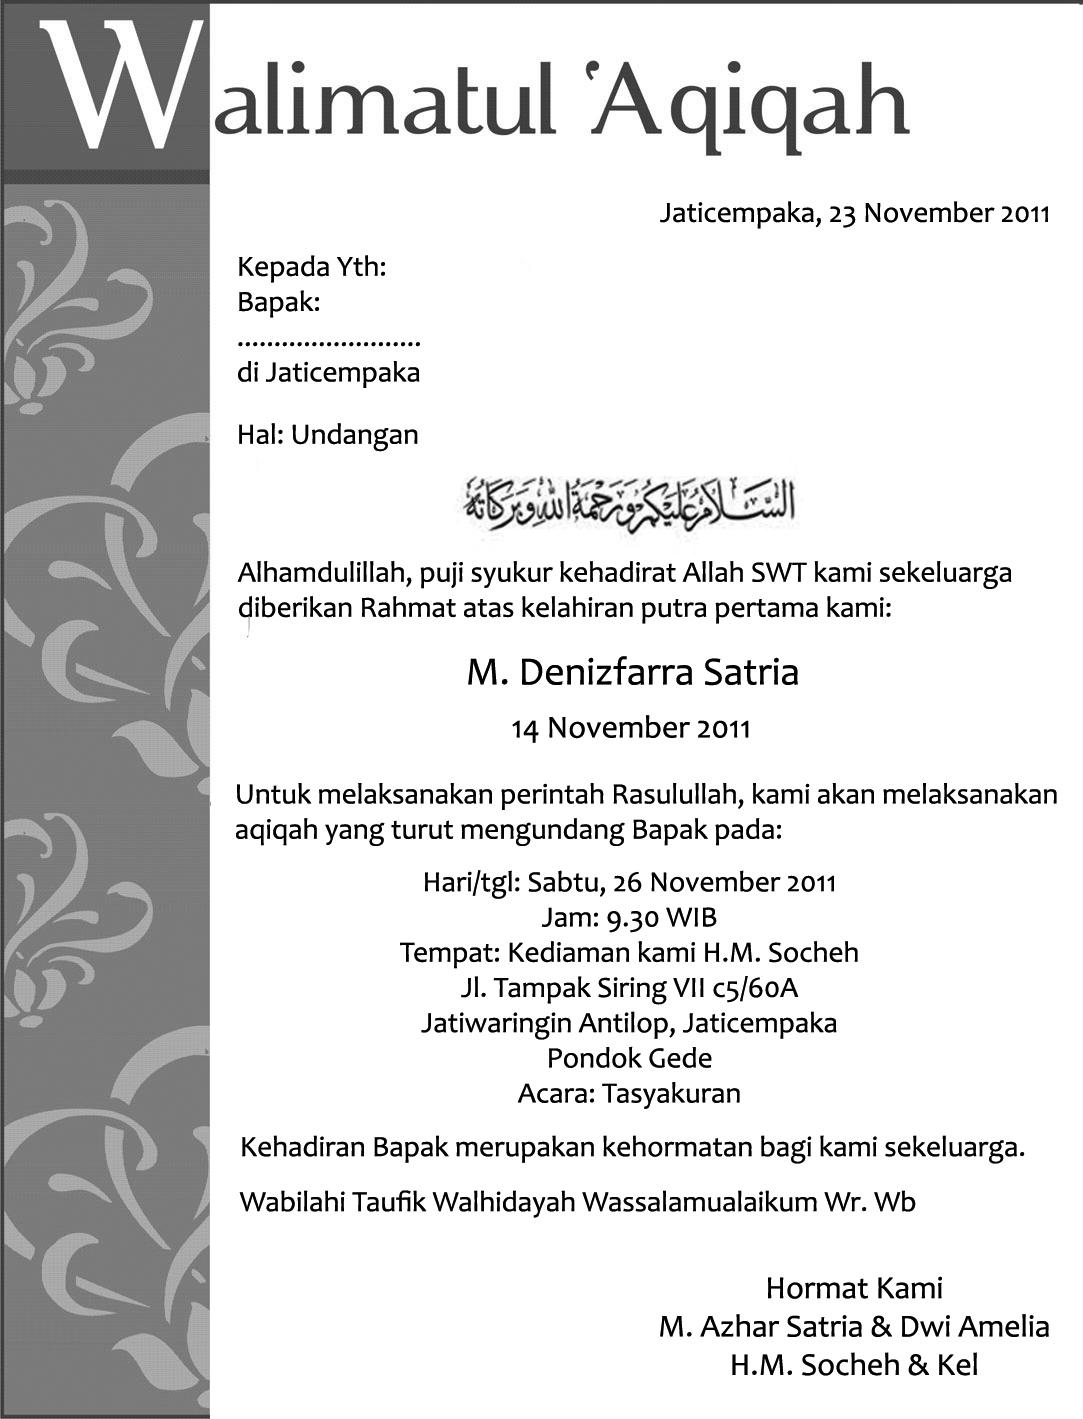 undangan aqiqah acara aqiqah dede di acara aqiqah dede ini